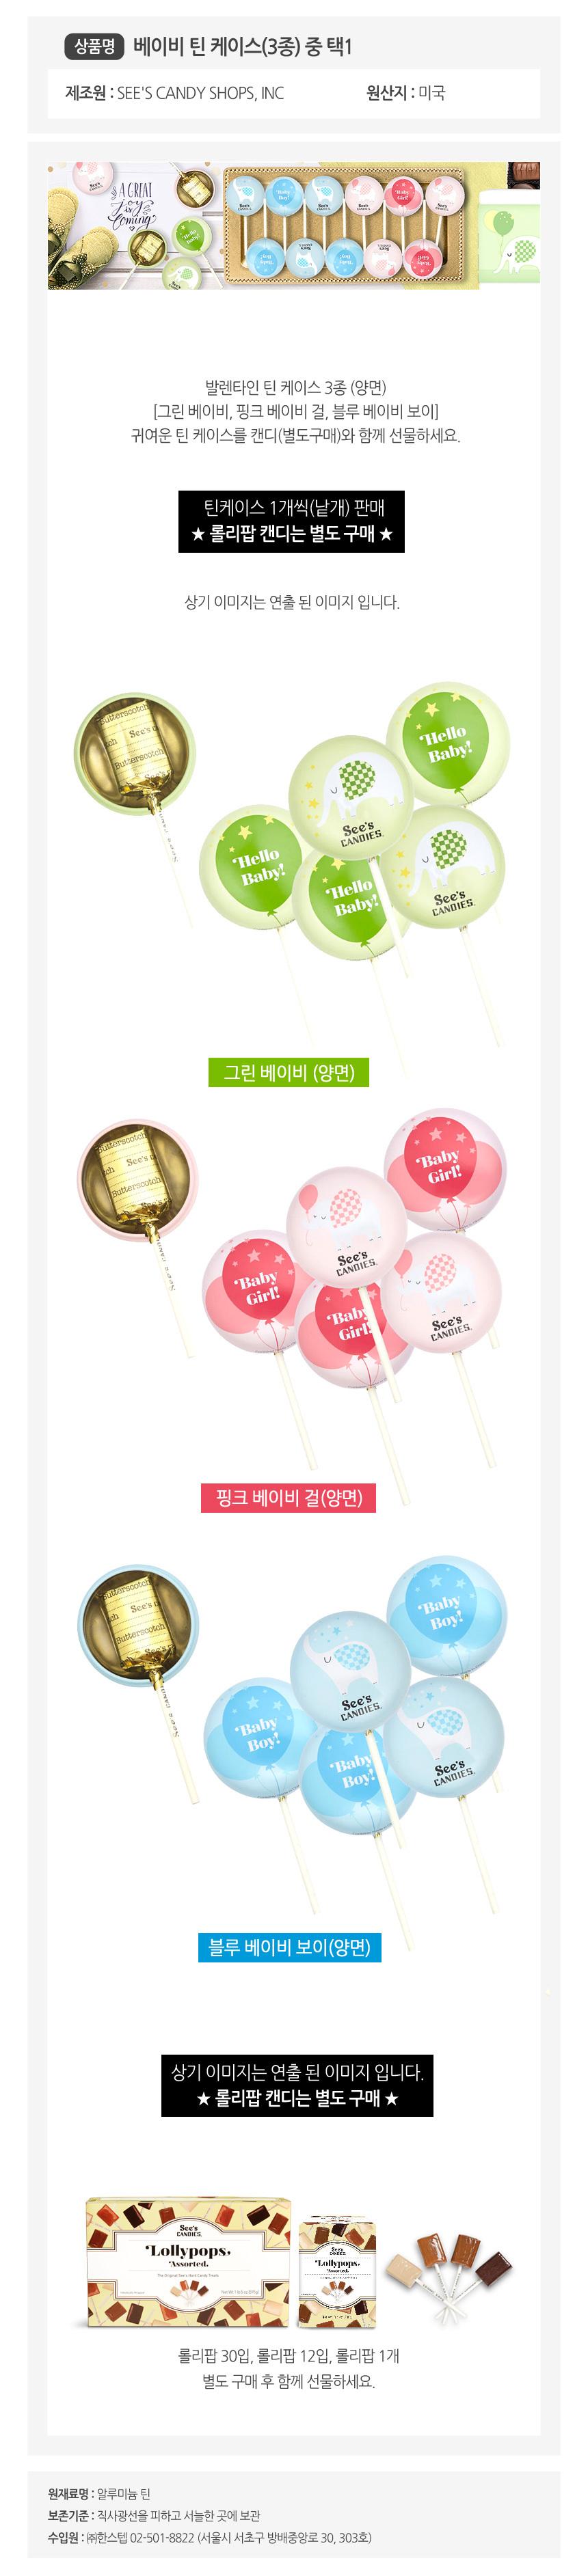 lollypops_tin_baby.jpg